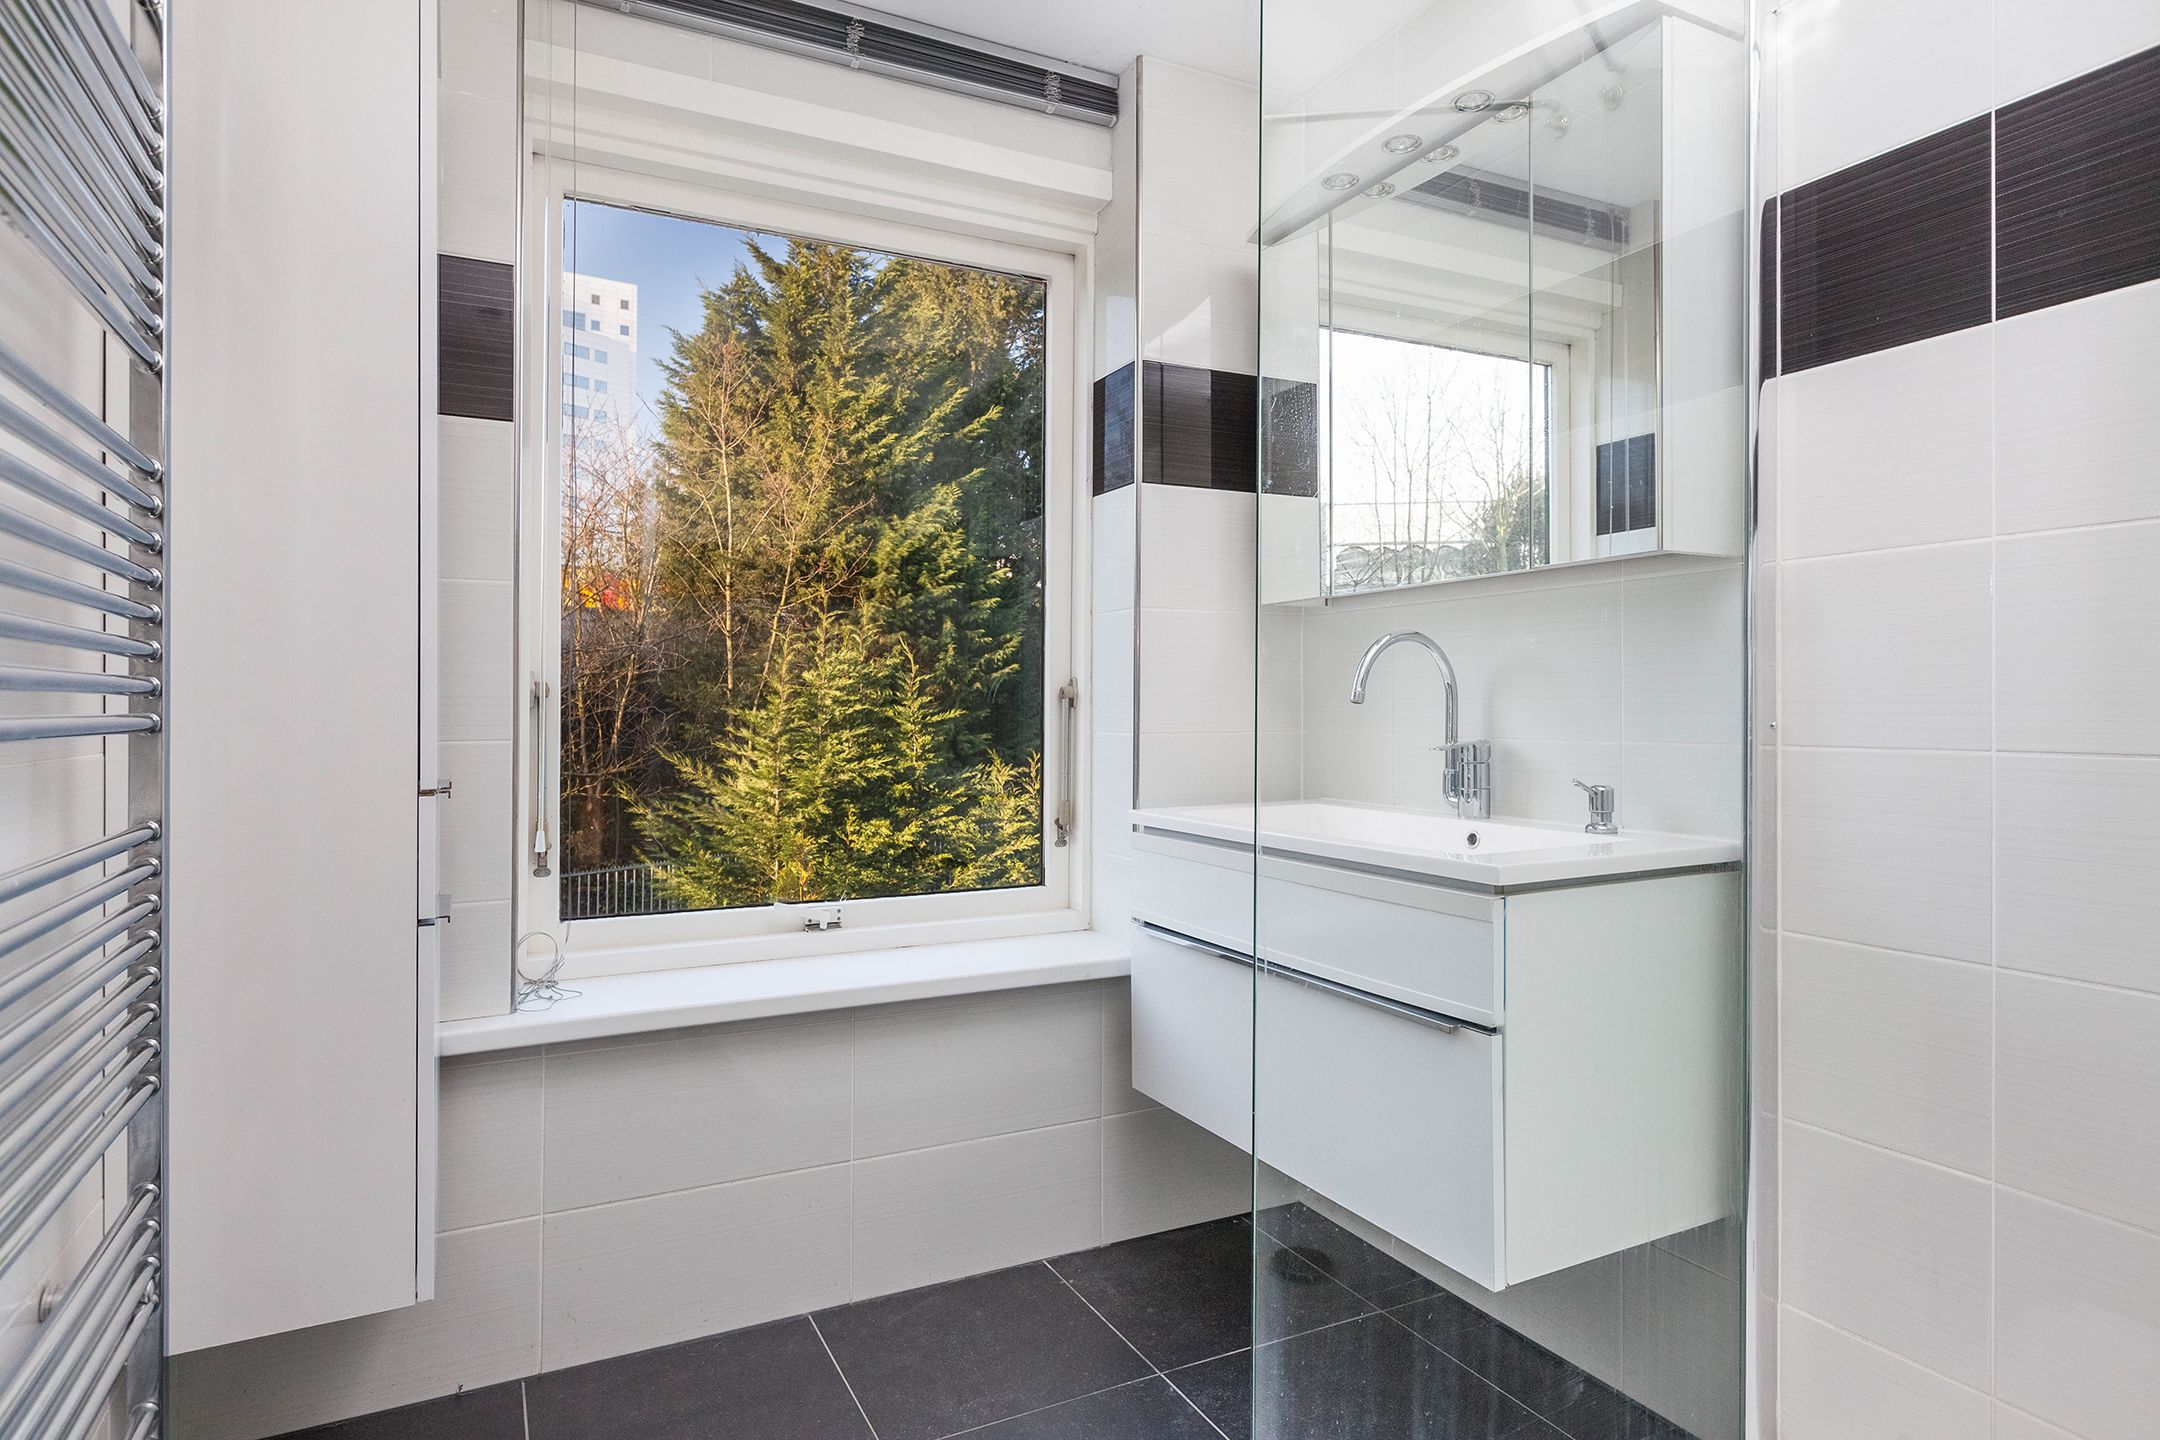 Design Badkamer Radiator : Design radiator inloopdouche moderne badkamer woning verkoop